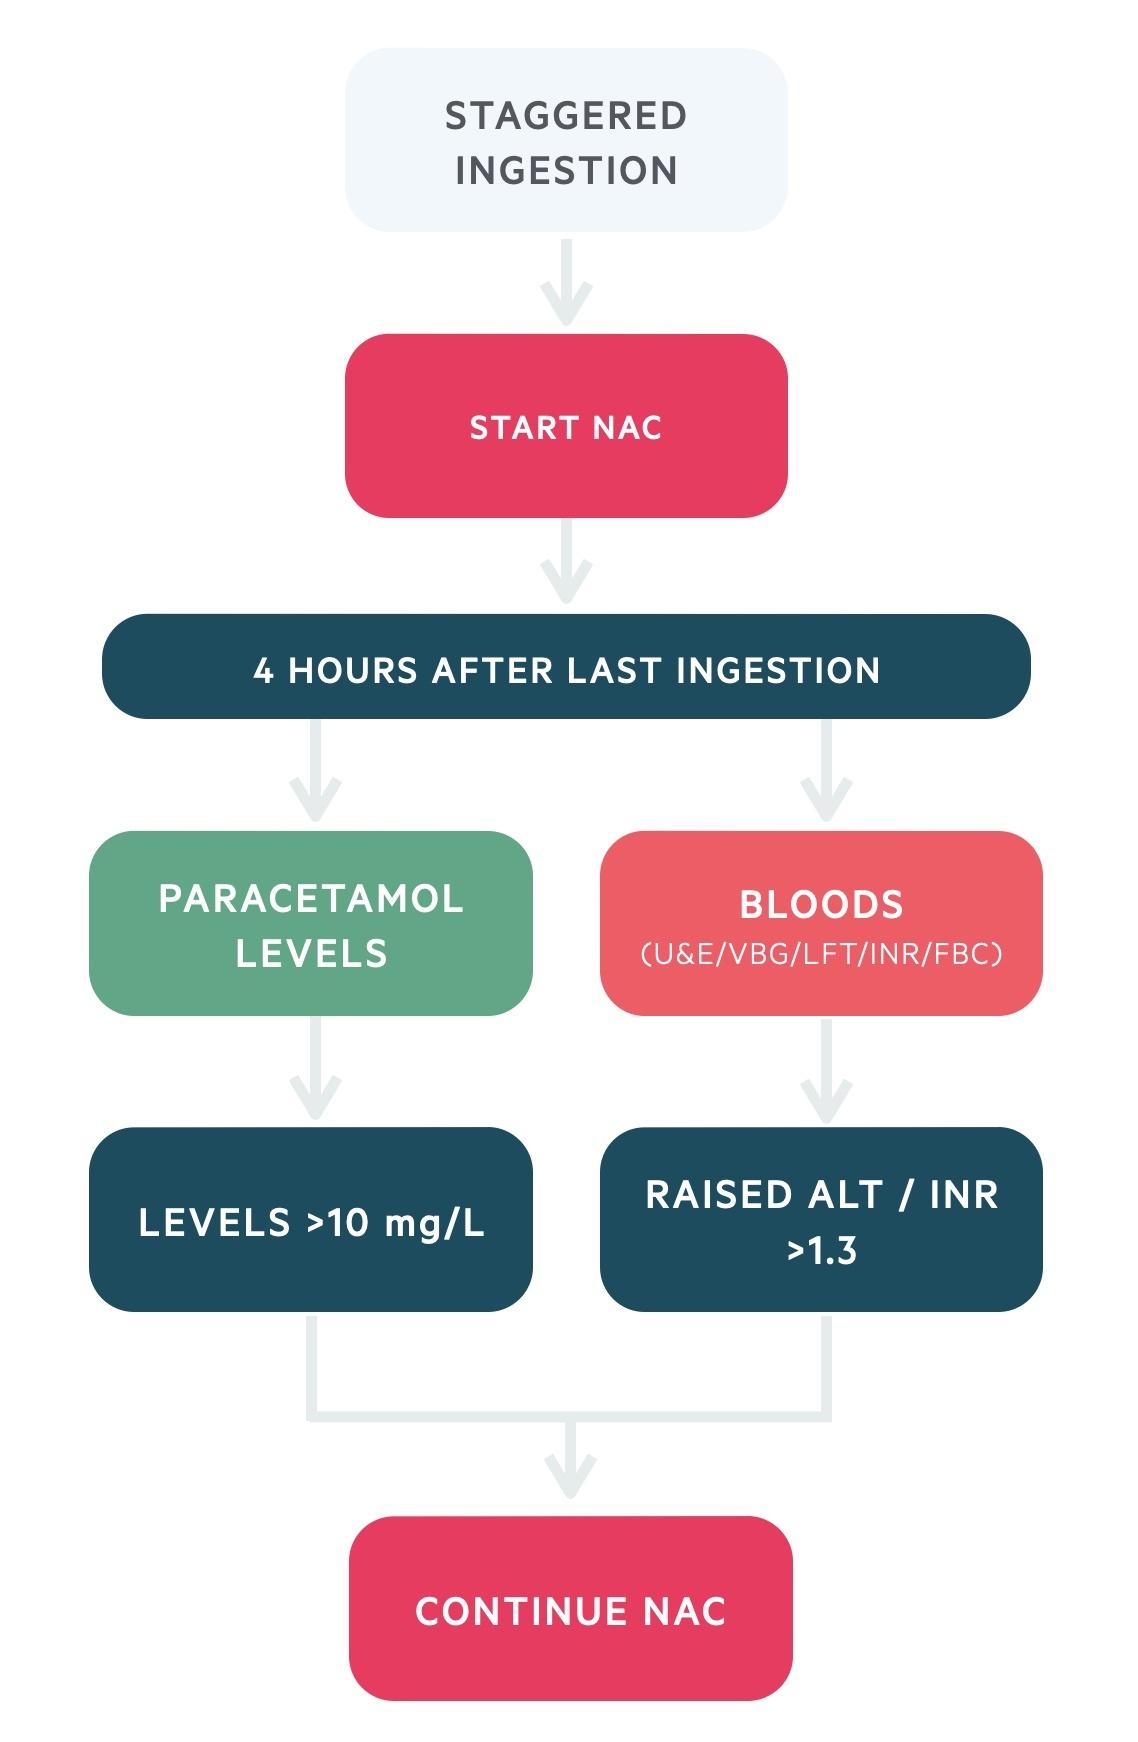 Staggered ingestion paracetamol overdose management